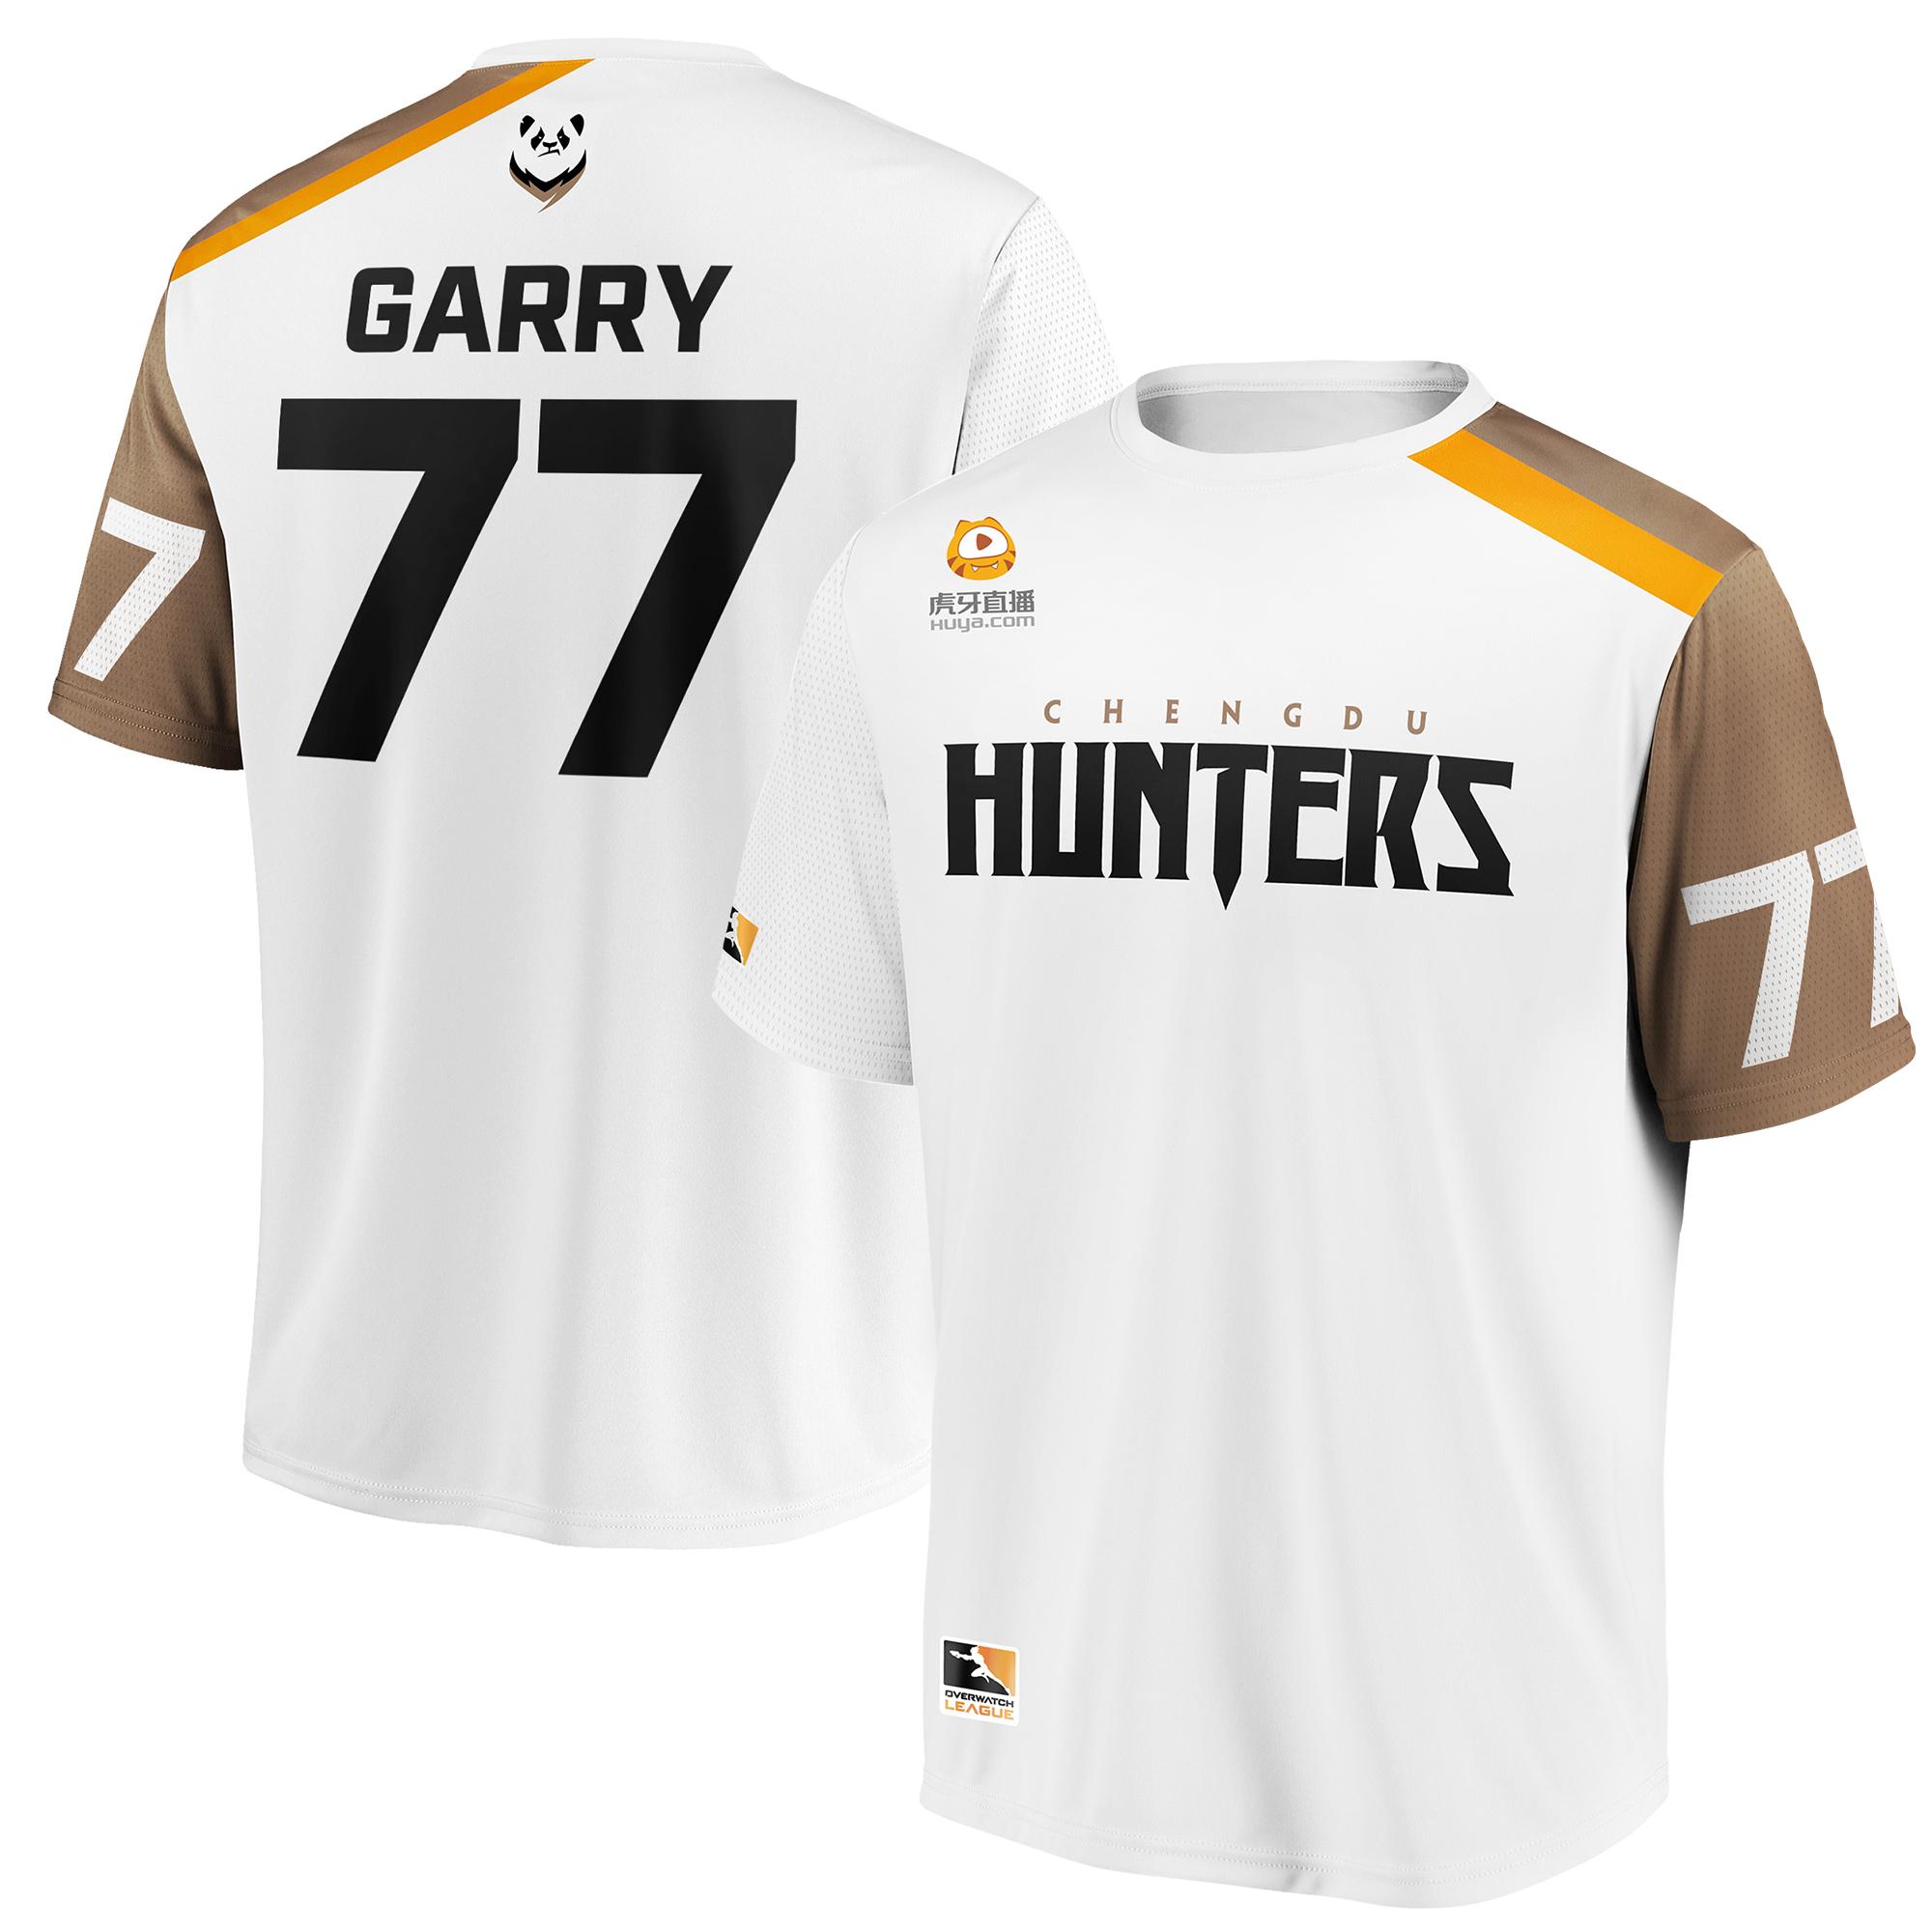 Garry Chengdu Hunters Overwatch League Replica Away Jersey - White